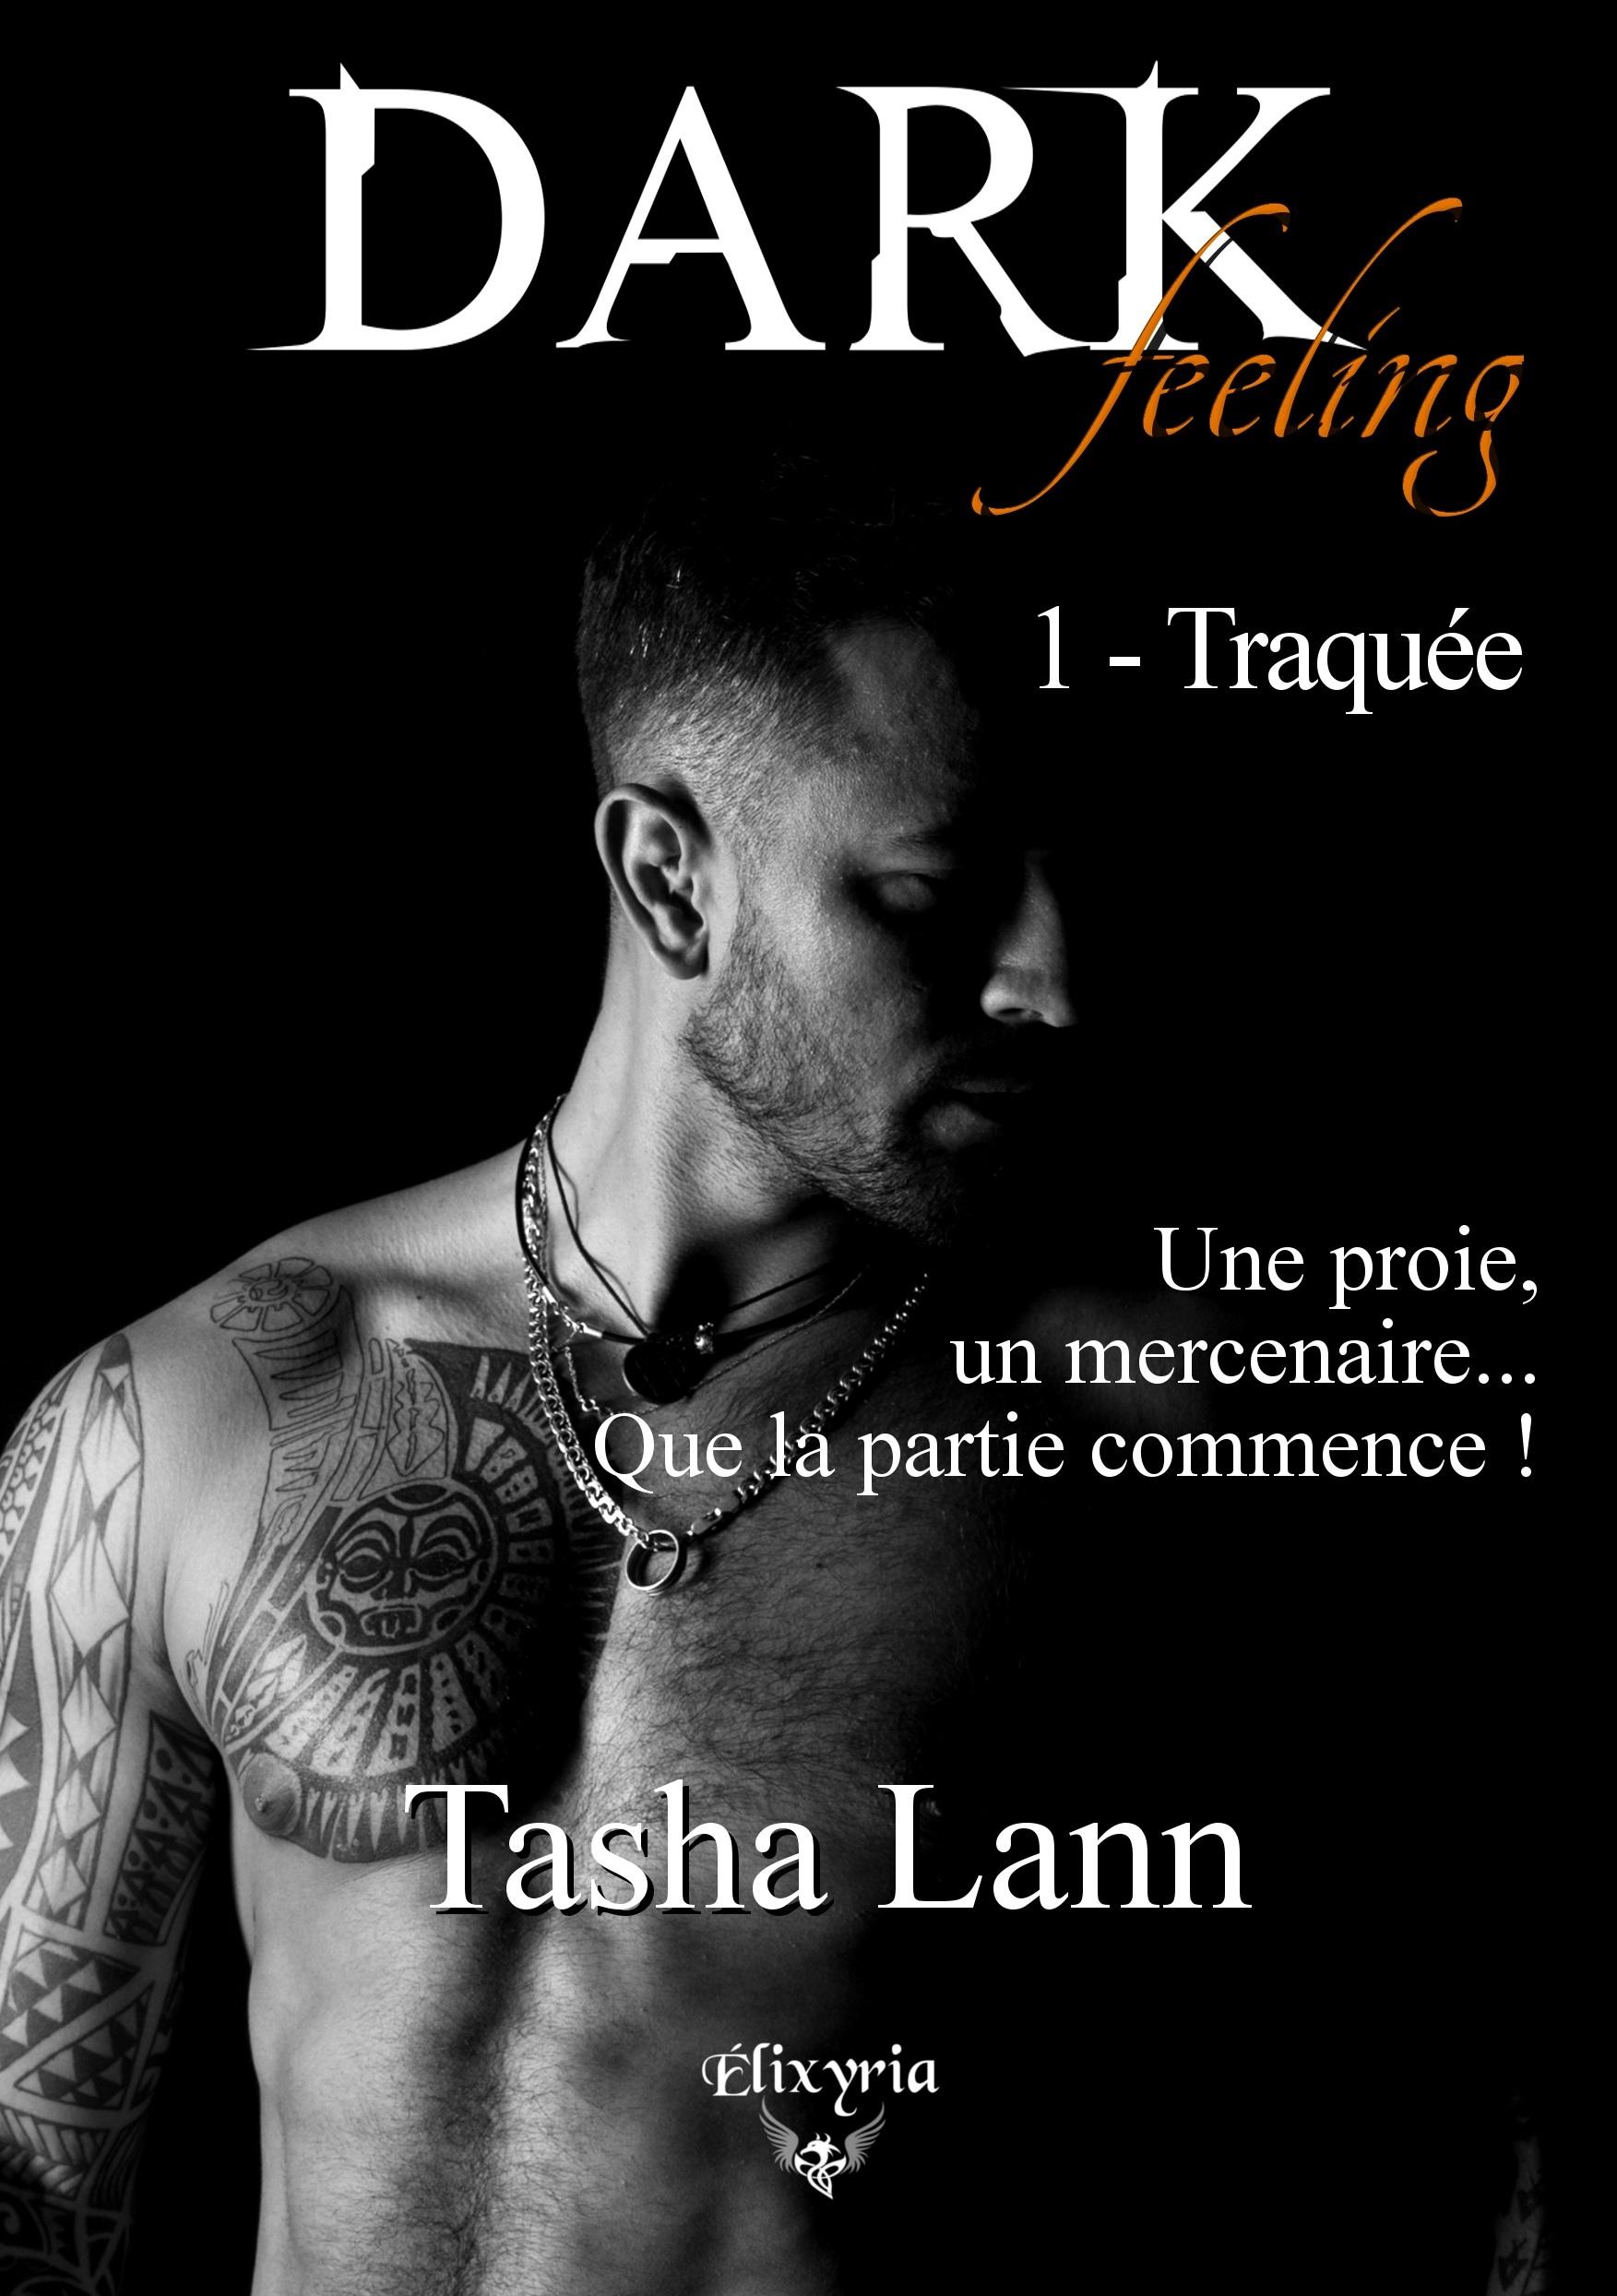 DARK FEELING - 1 - TRAQUEE